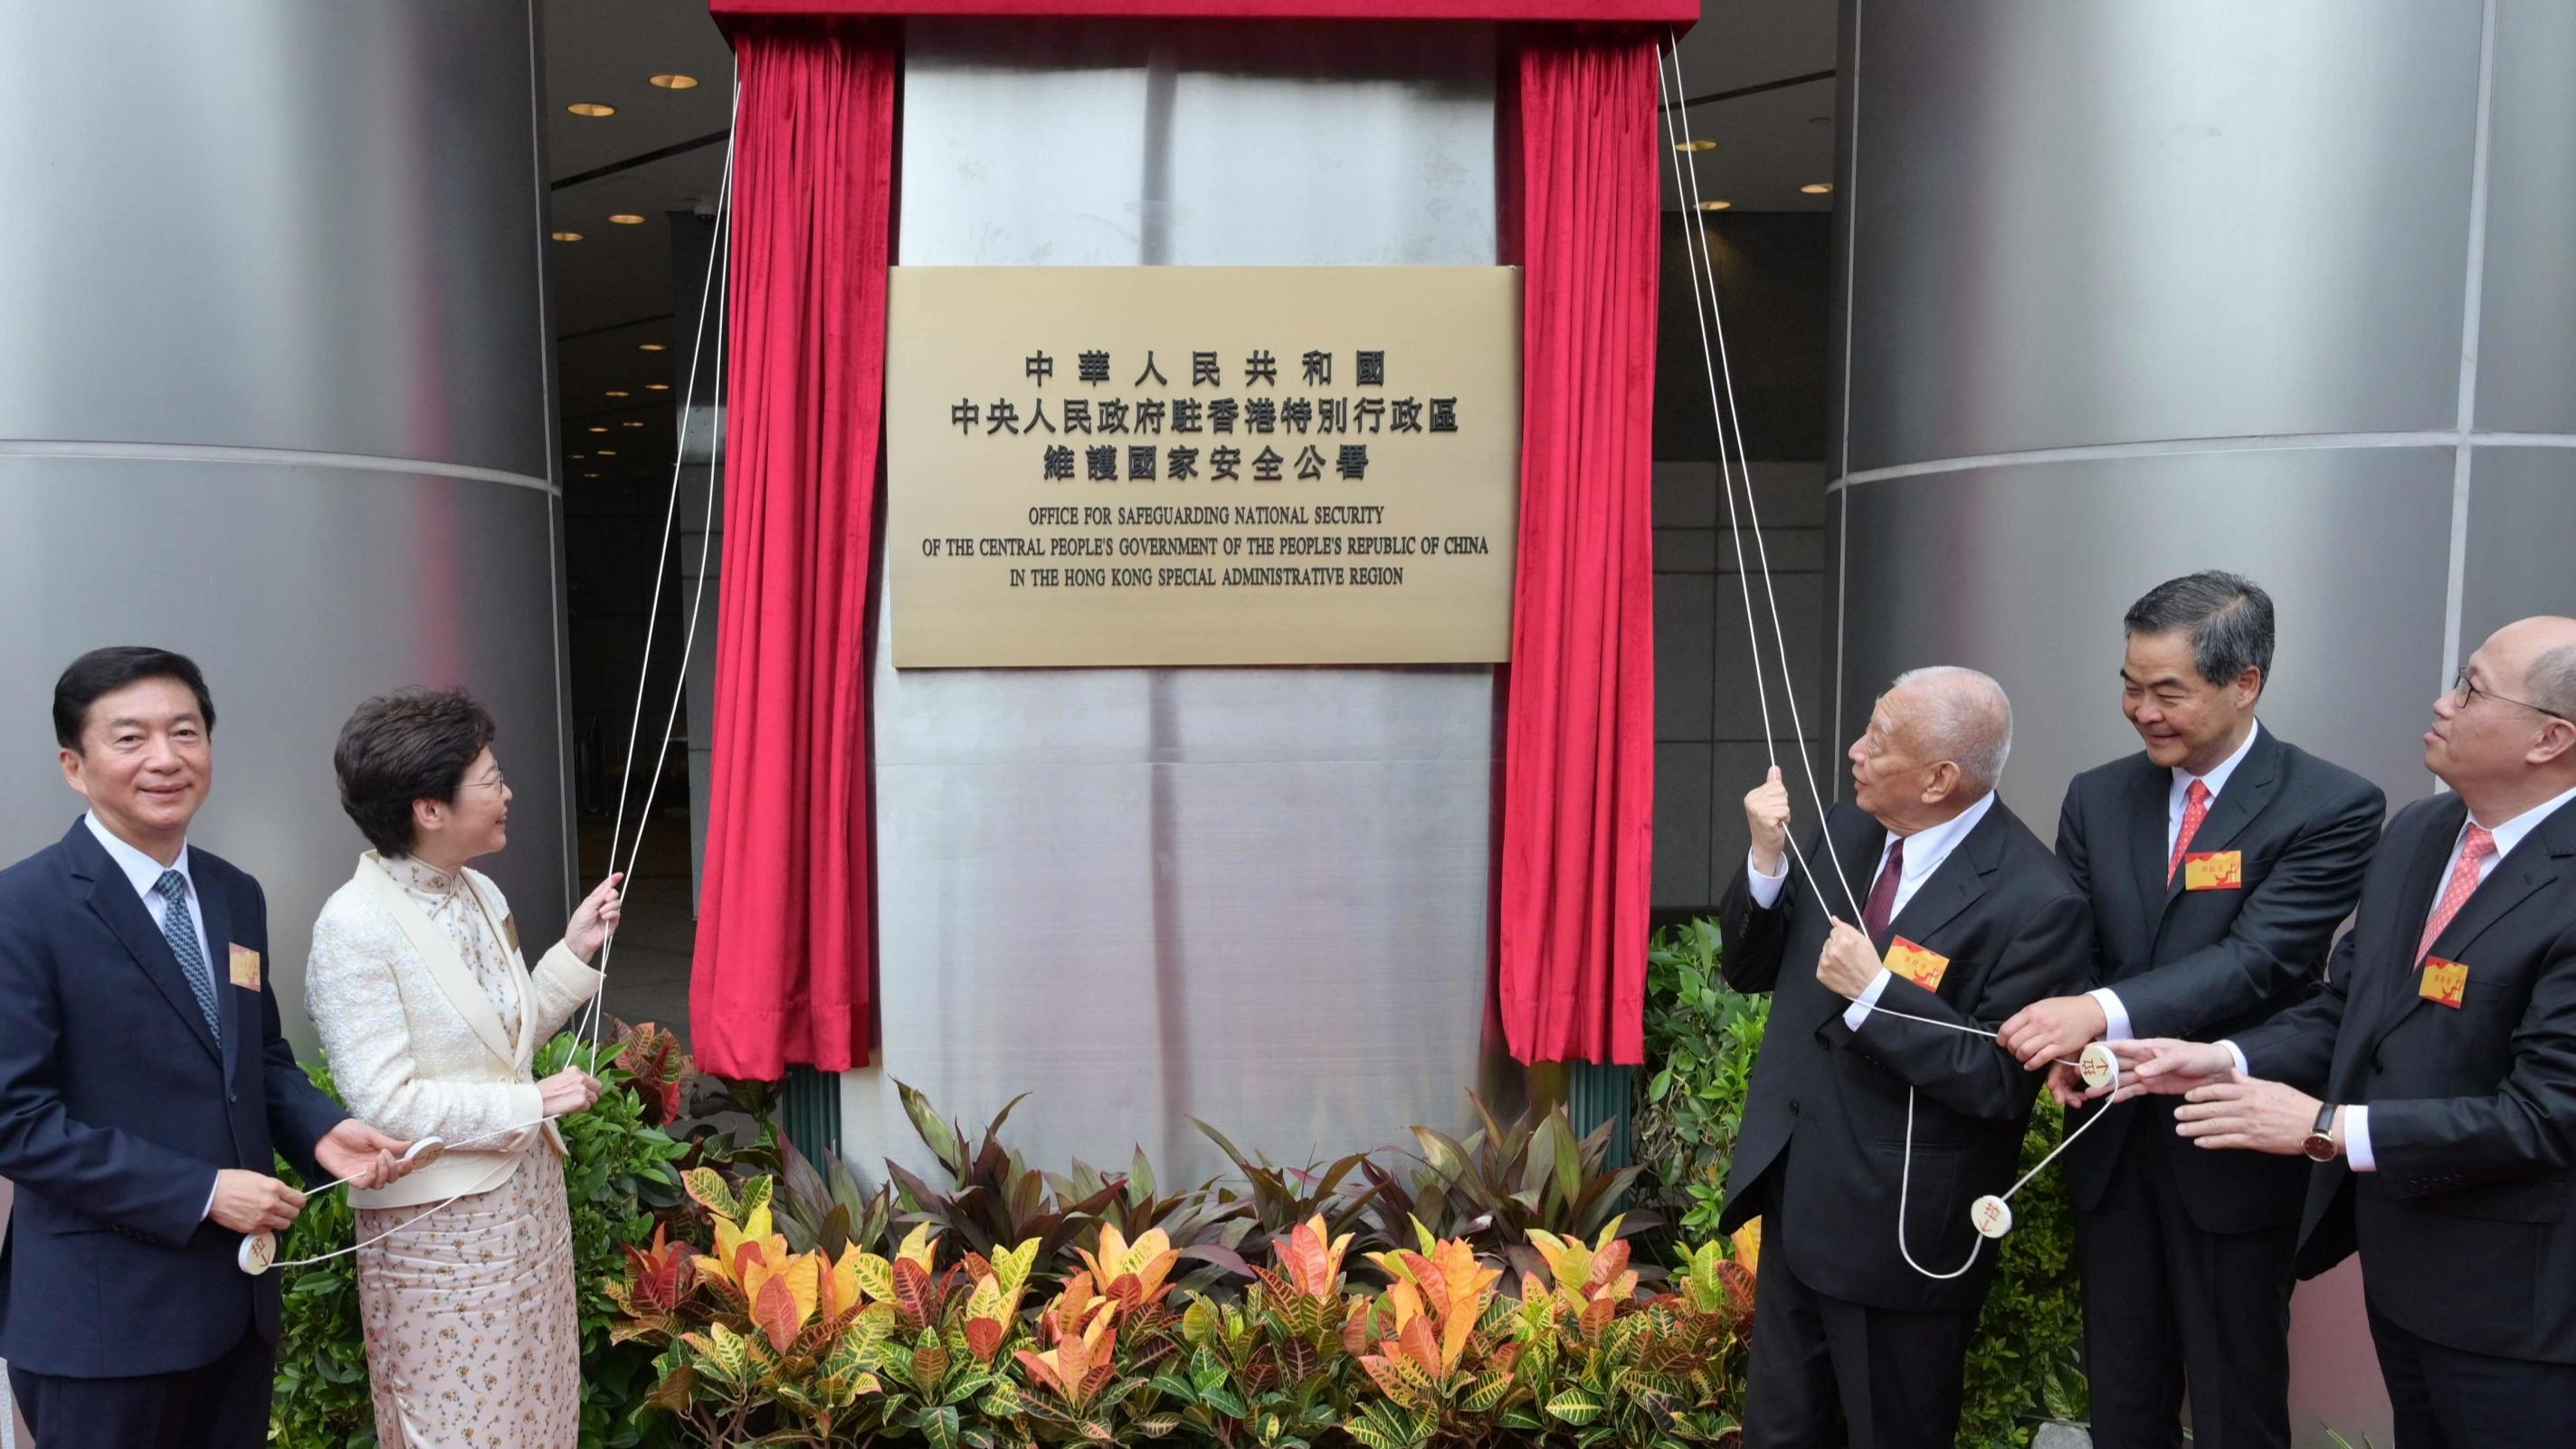 nikkei.com - KENJI KAWASE - China's new Hong Kong security agency pops up in four-star hotel